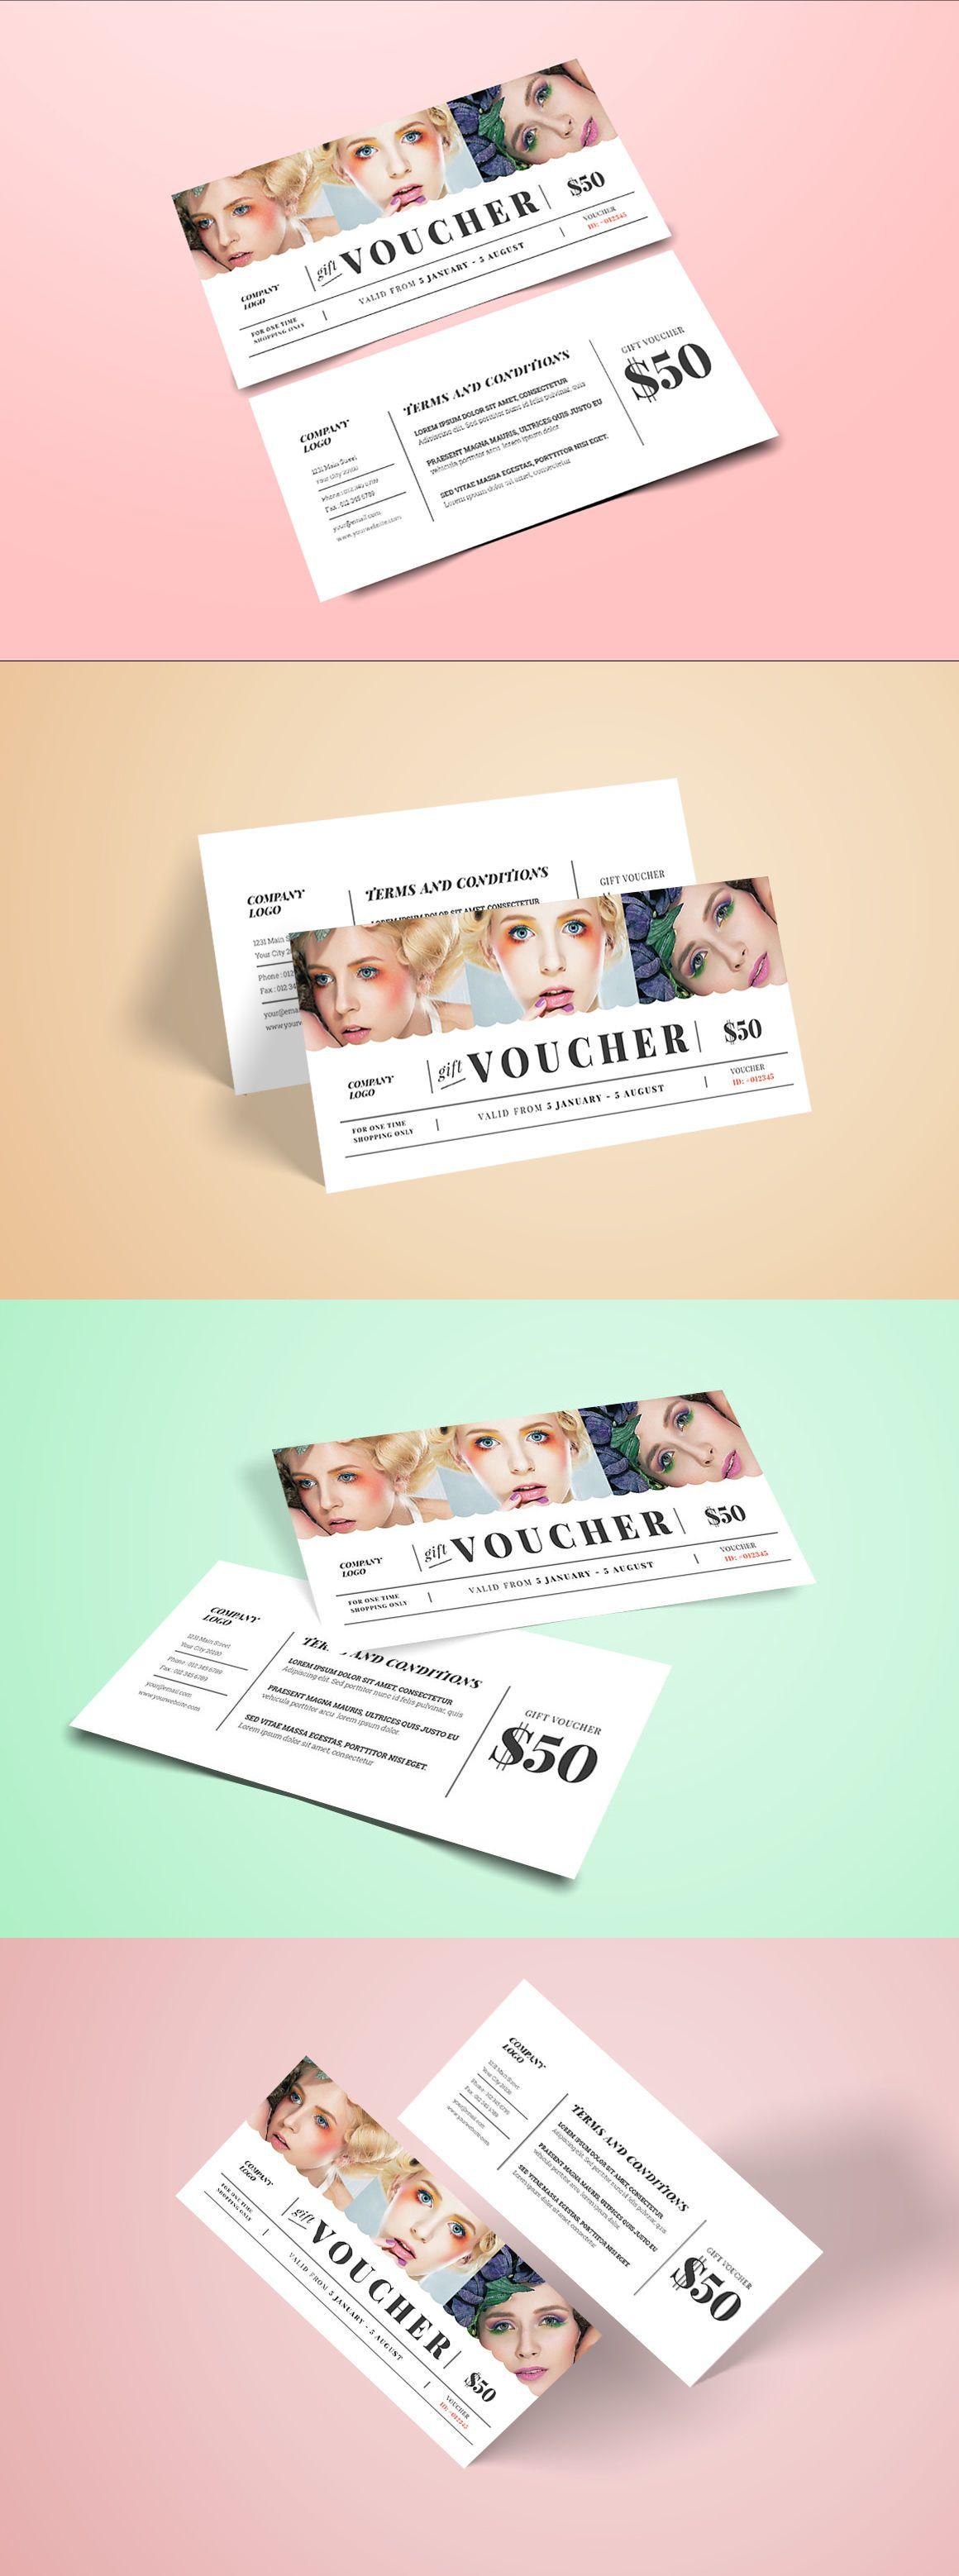 Fashion gift voucher template ai psd pinteres fashion gift voucher template ai xflitez Choice Image